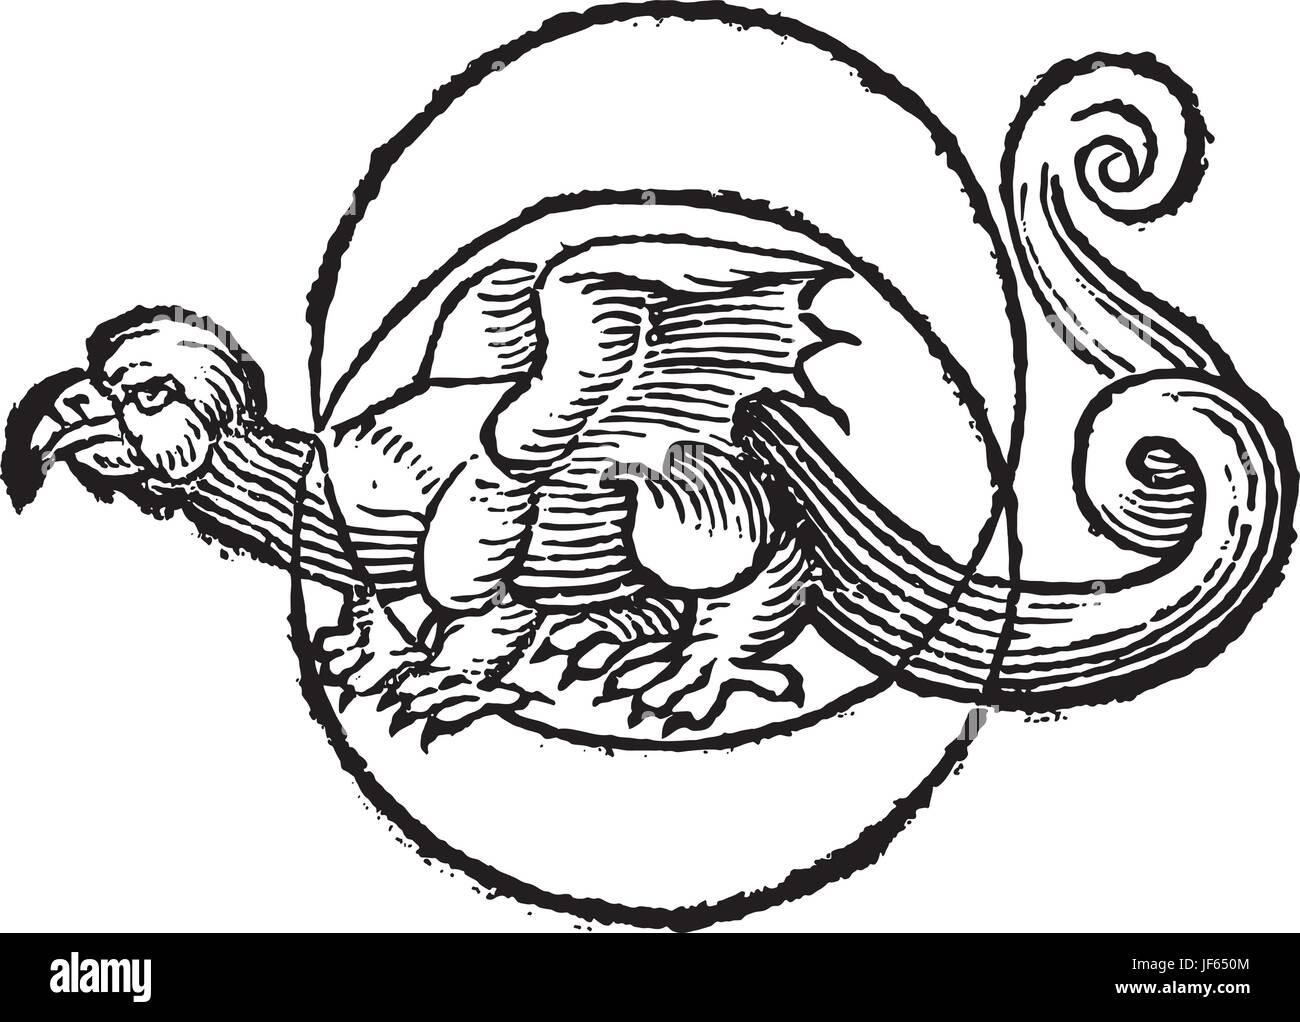 Moon Snake Dragon Pictogram Symbol Pictograph Trade Art